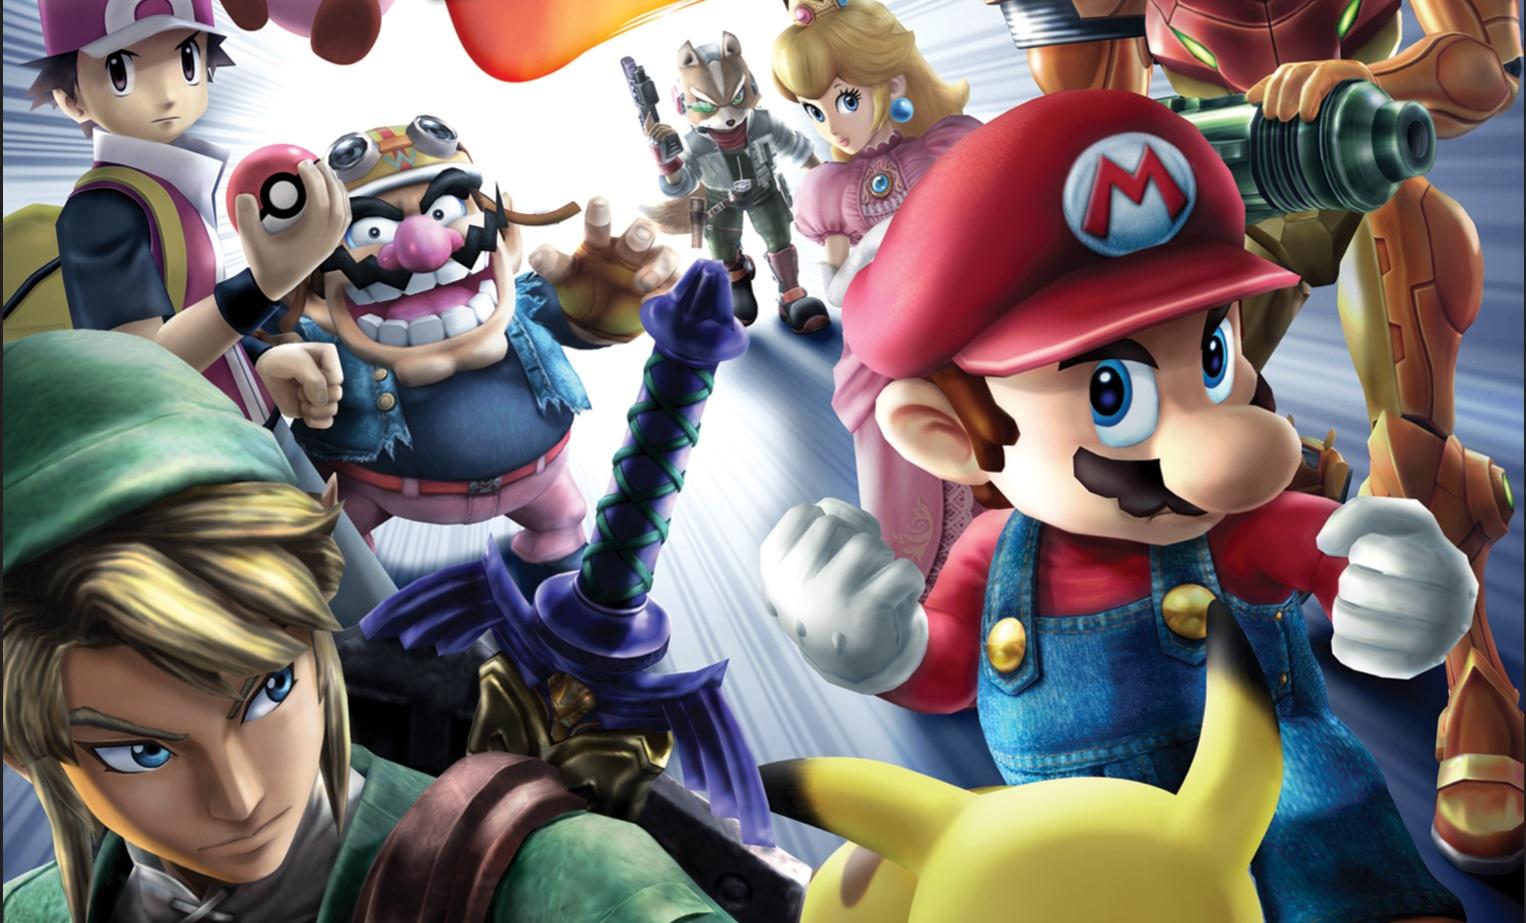 Sakurai: Both Wii U & 3DS versions of Smash Bros. at E3